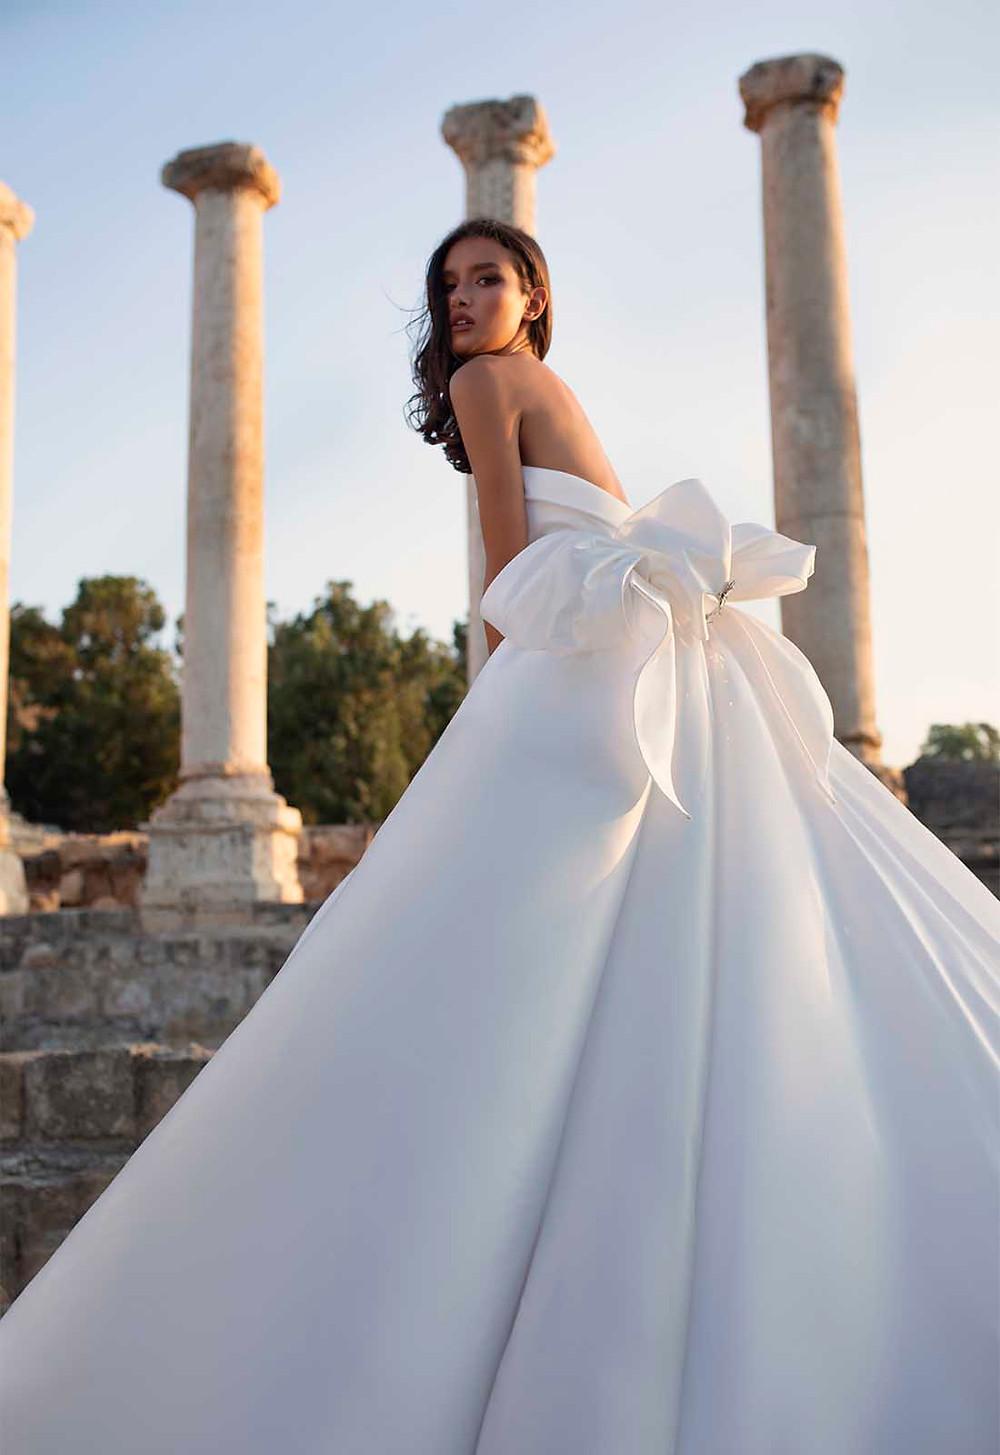 A Pnina Tornai strapless silk princess ball gown wedding dress with a bow